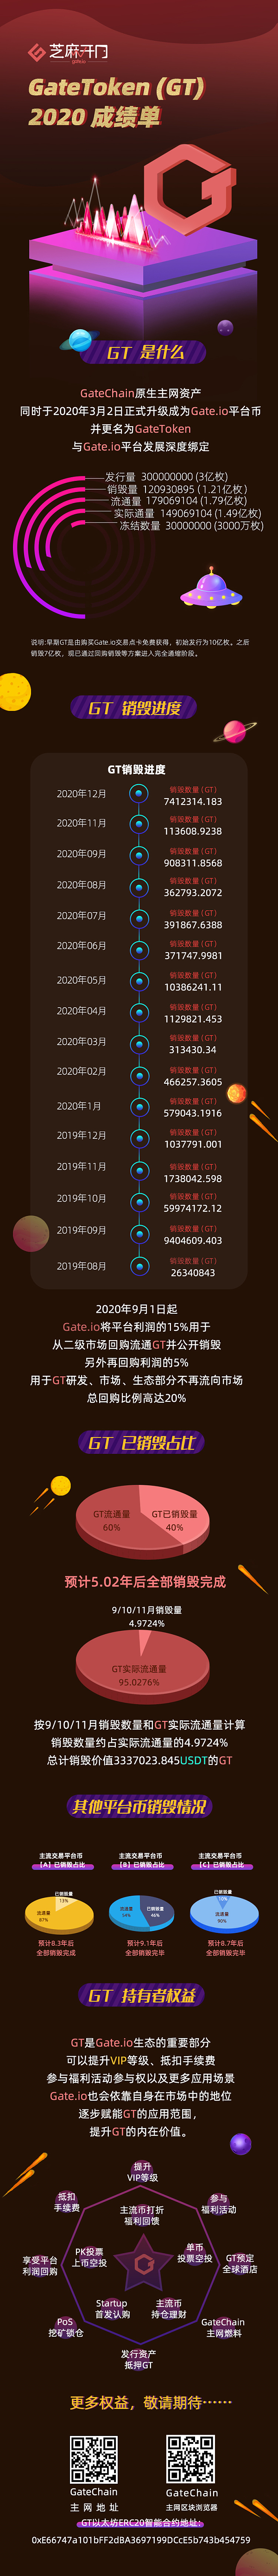 Gate.io芝麻开门:GateToken(GT)2020成绩单